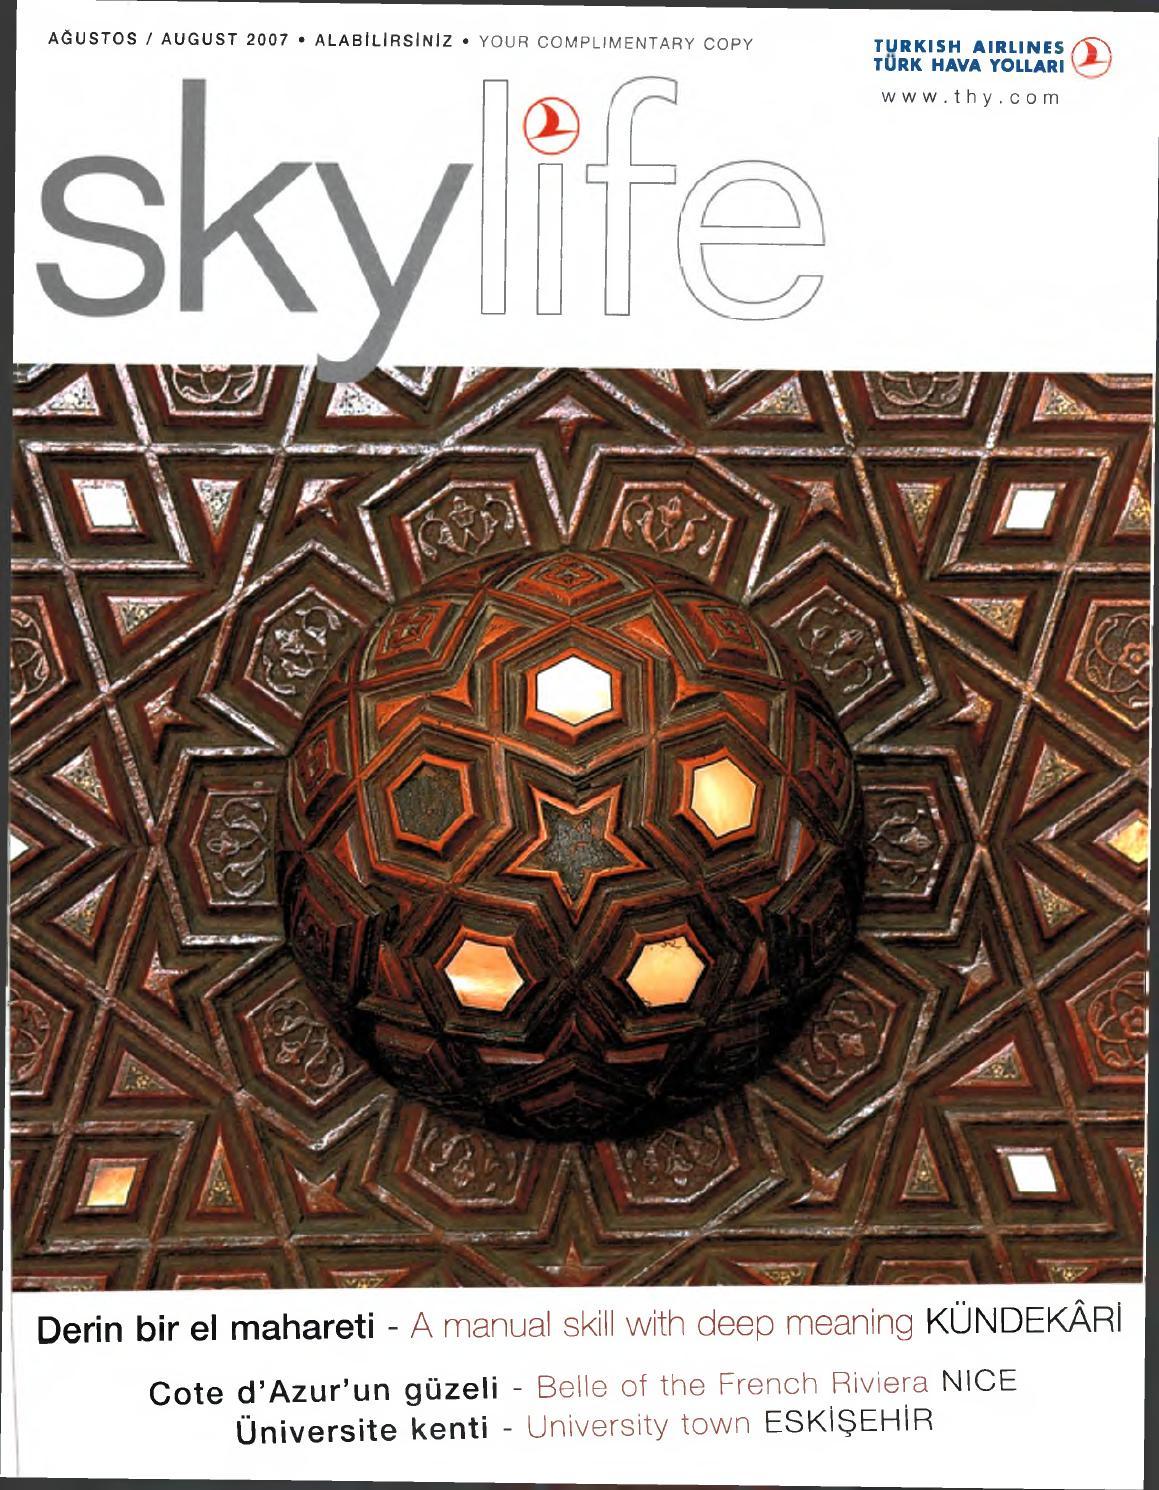 3c34c52153fcb 2007-08 by Skylife Magazine - issuu